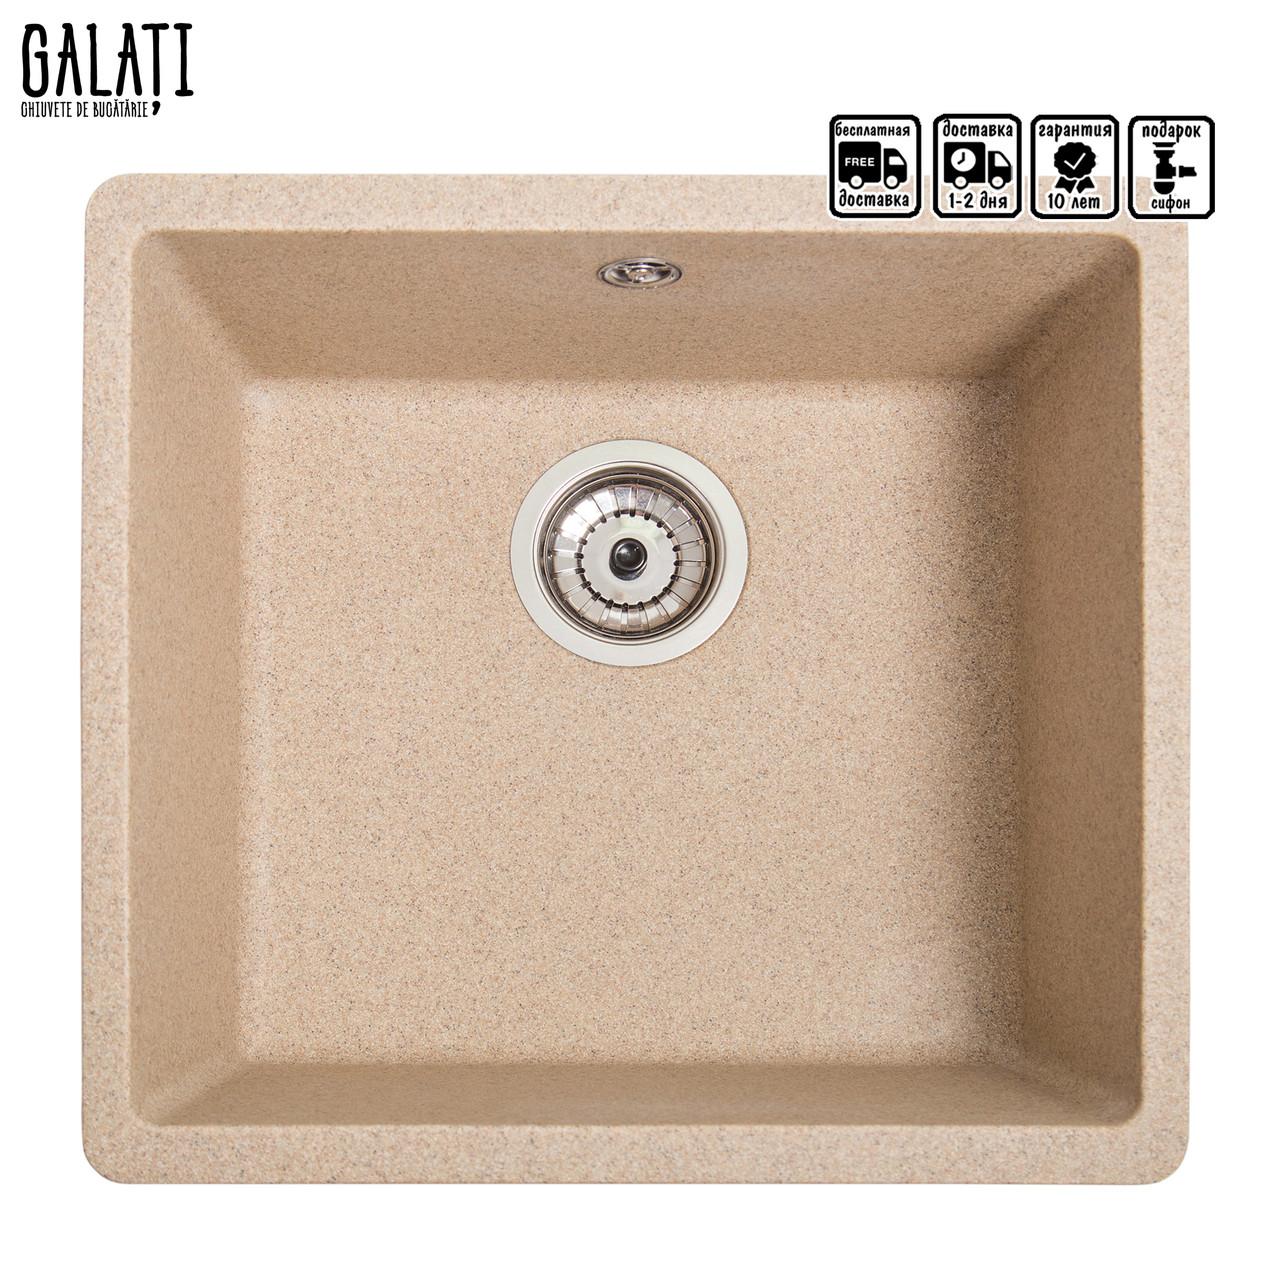 Кухонная мойка Galati Mira U-400 Piesok (301)